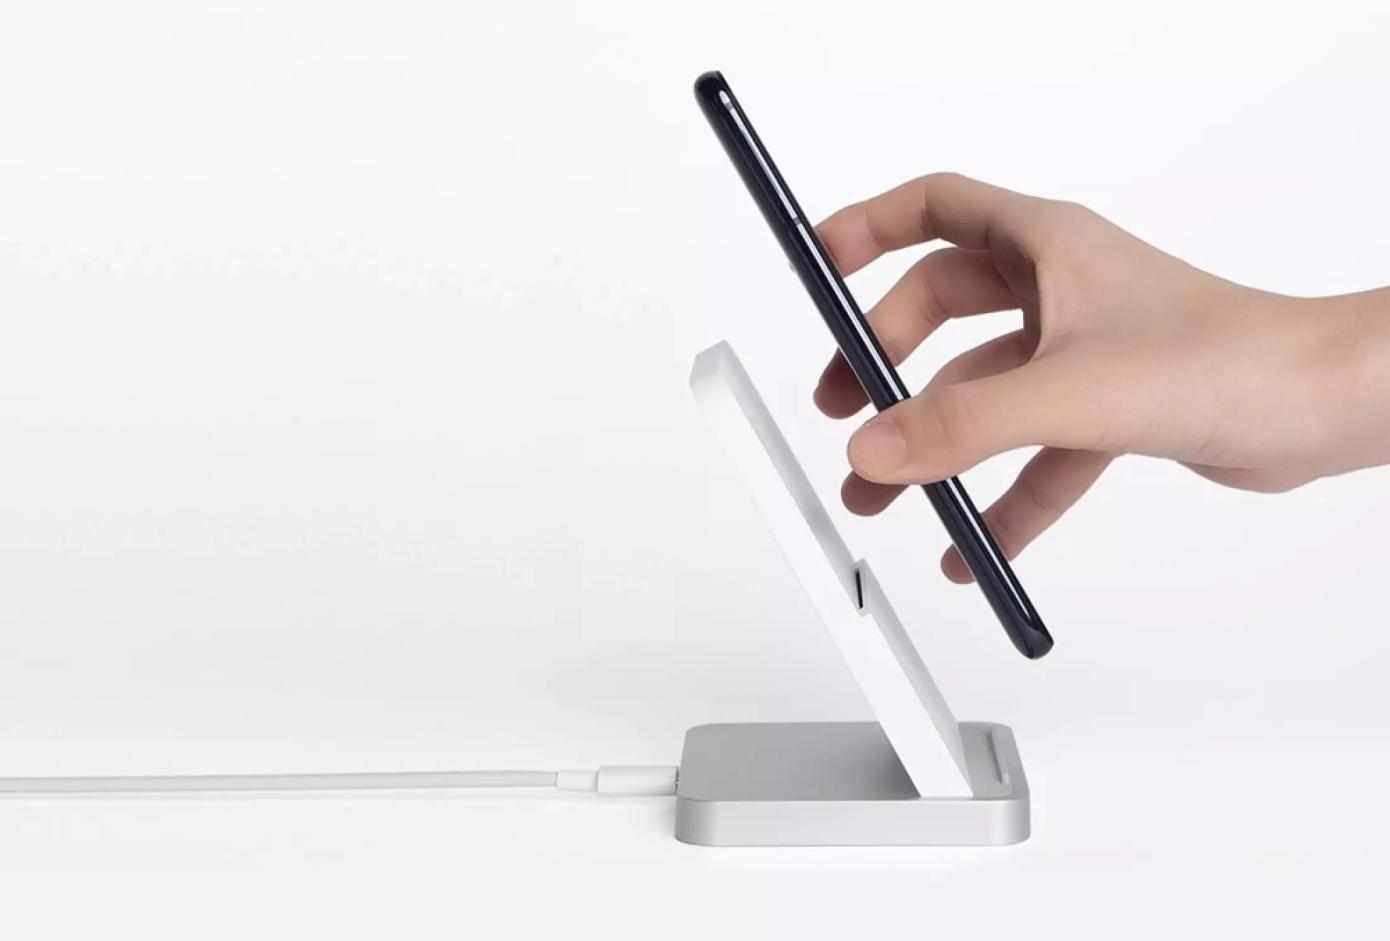 Opisanie Besprovodnoe Zaryadnoe Ustrojstvo Xiaomi Vertical Air Cooled Wireless Charger 30w Mdy 11 Eg 3